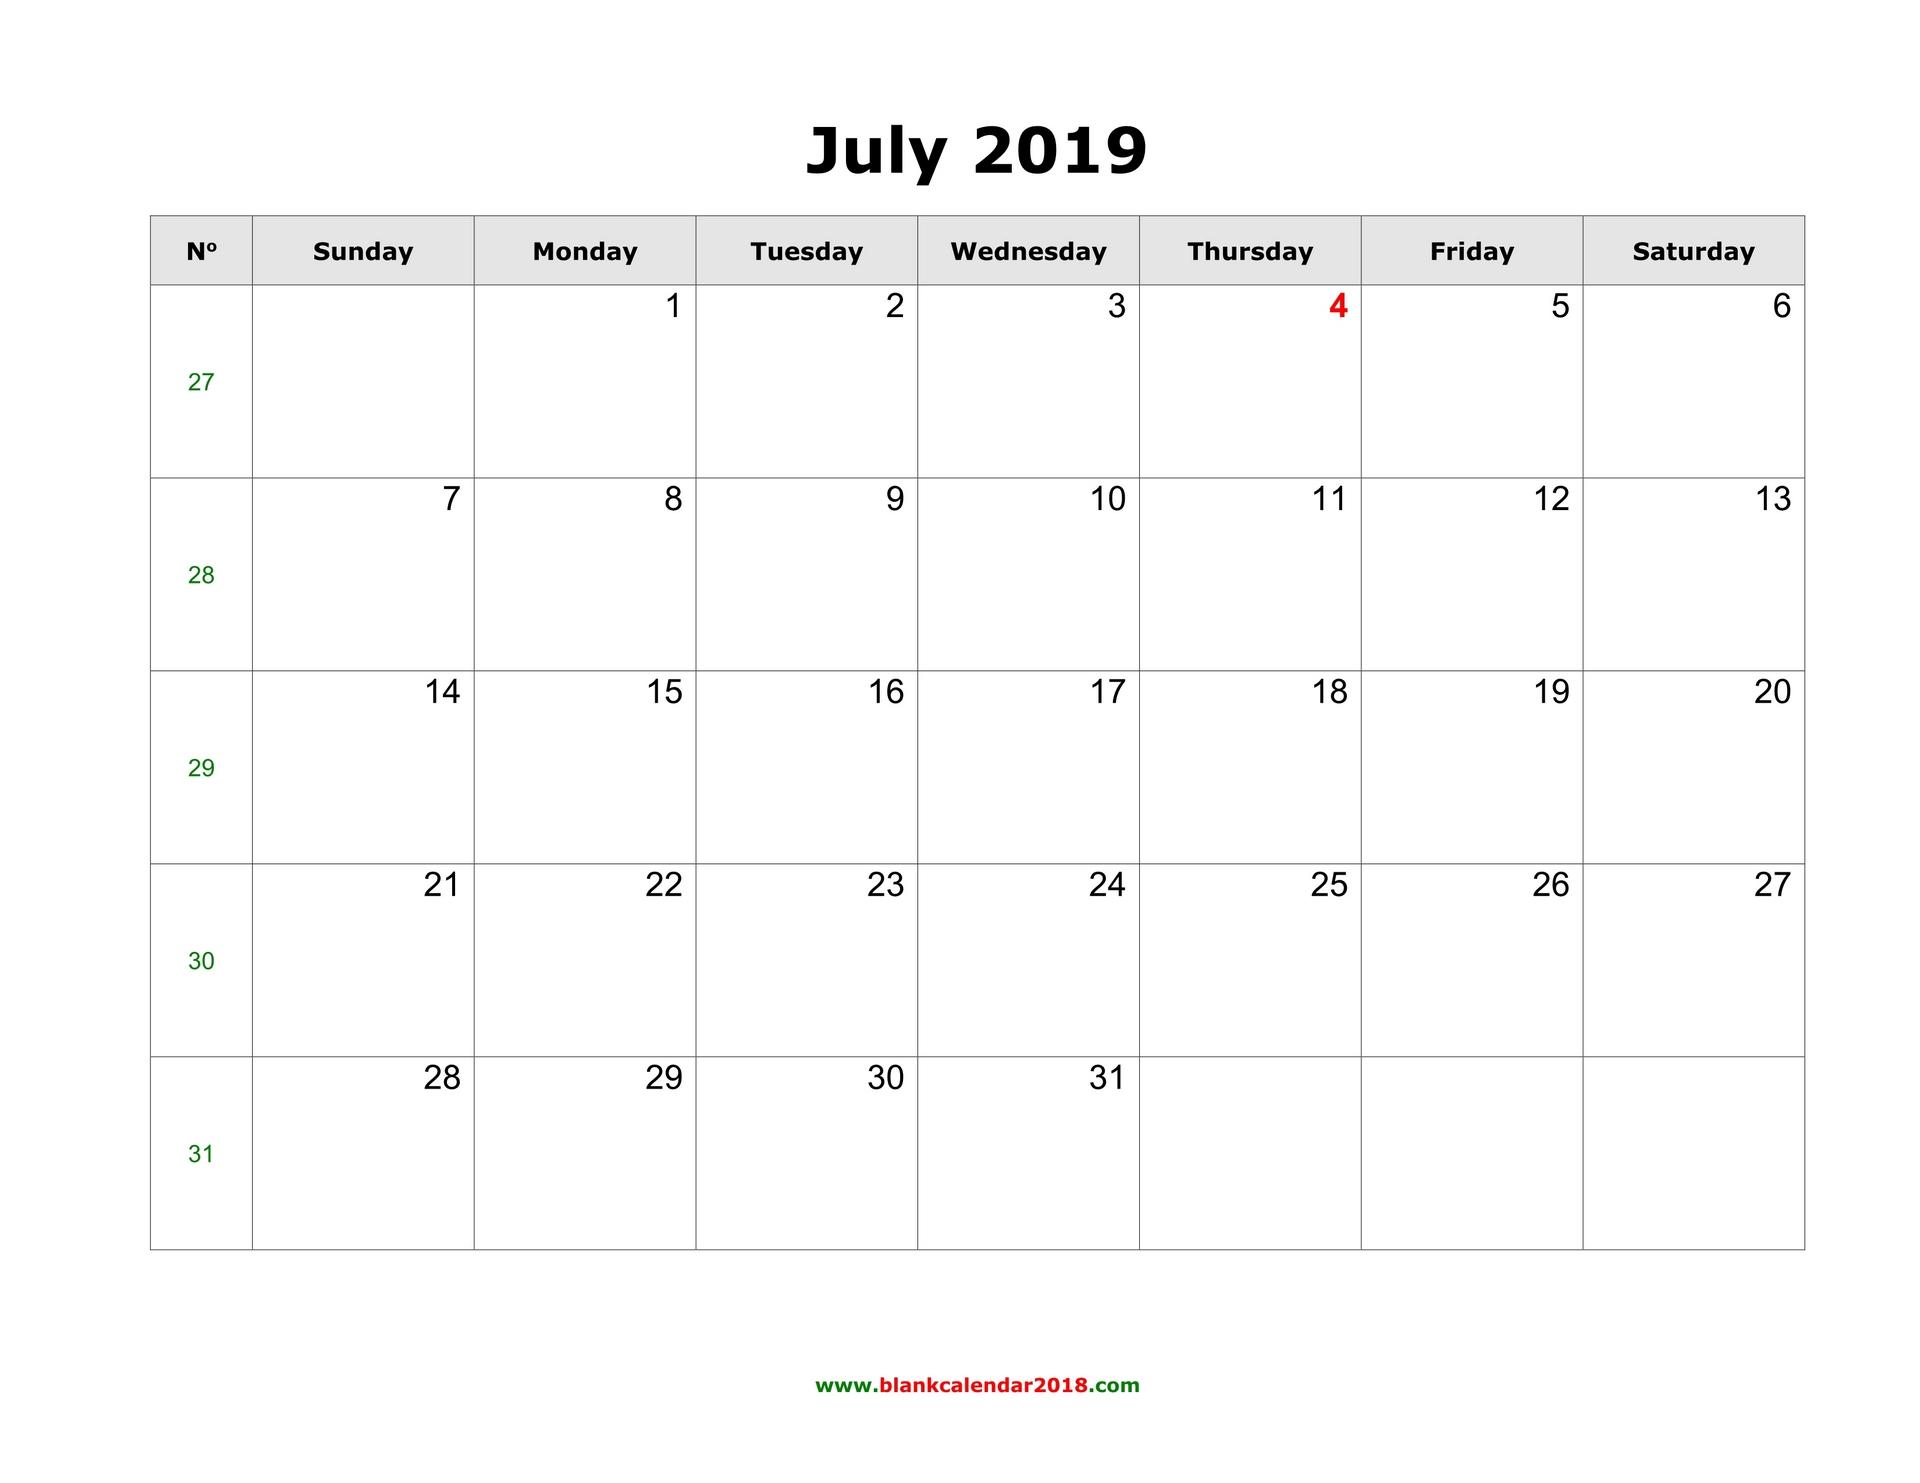 Print July 2019 Calendar Excel